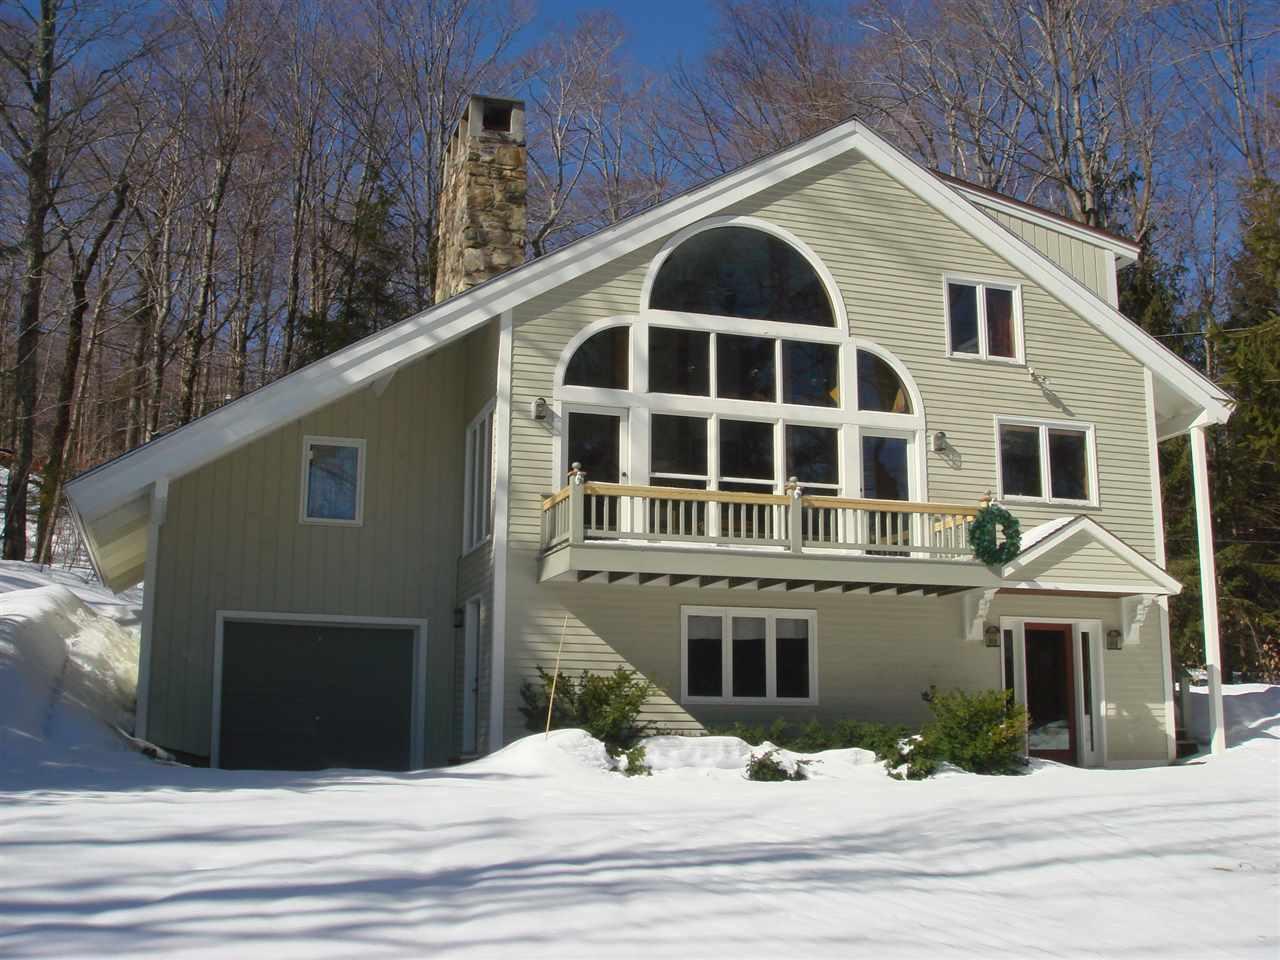 Mount-Snow-Real-Estate-4614113-1